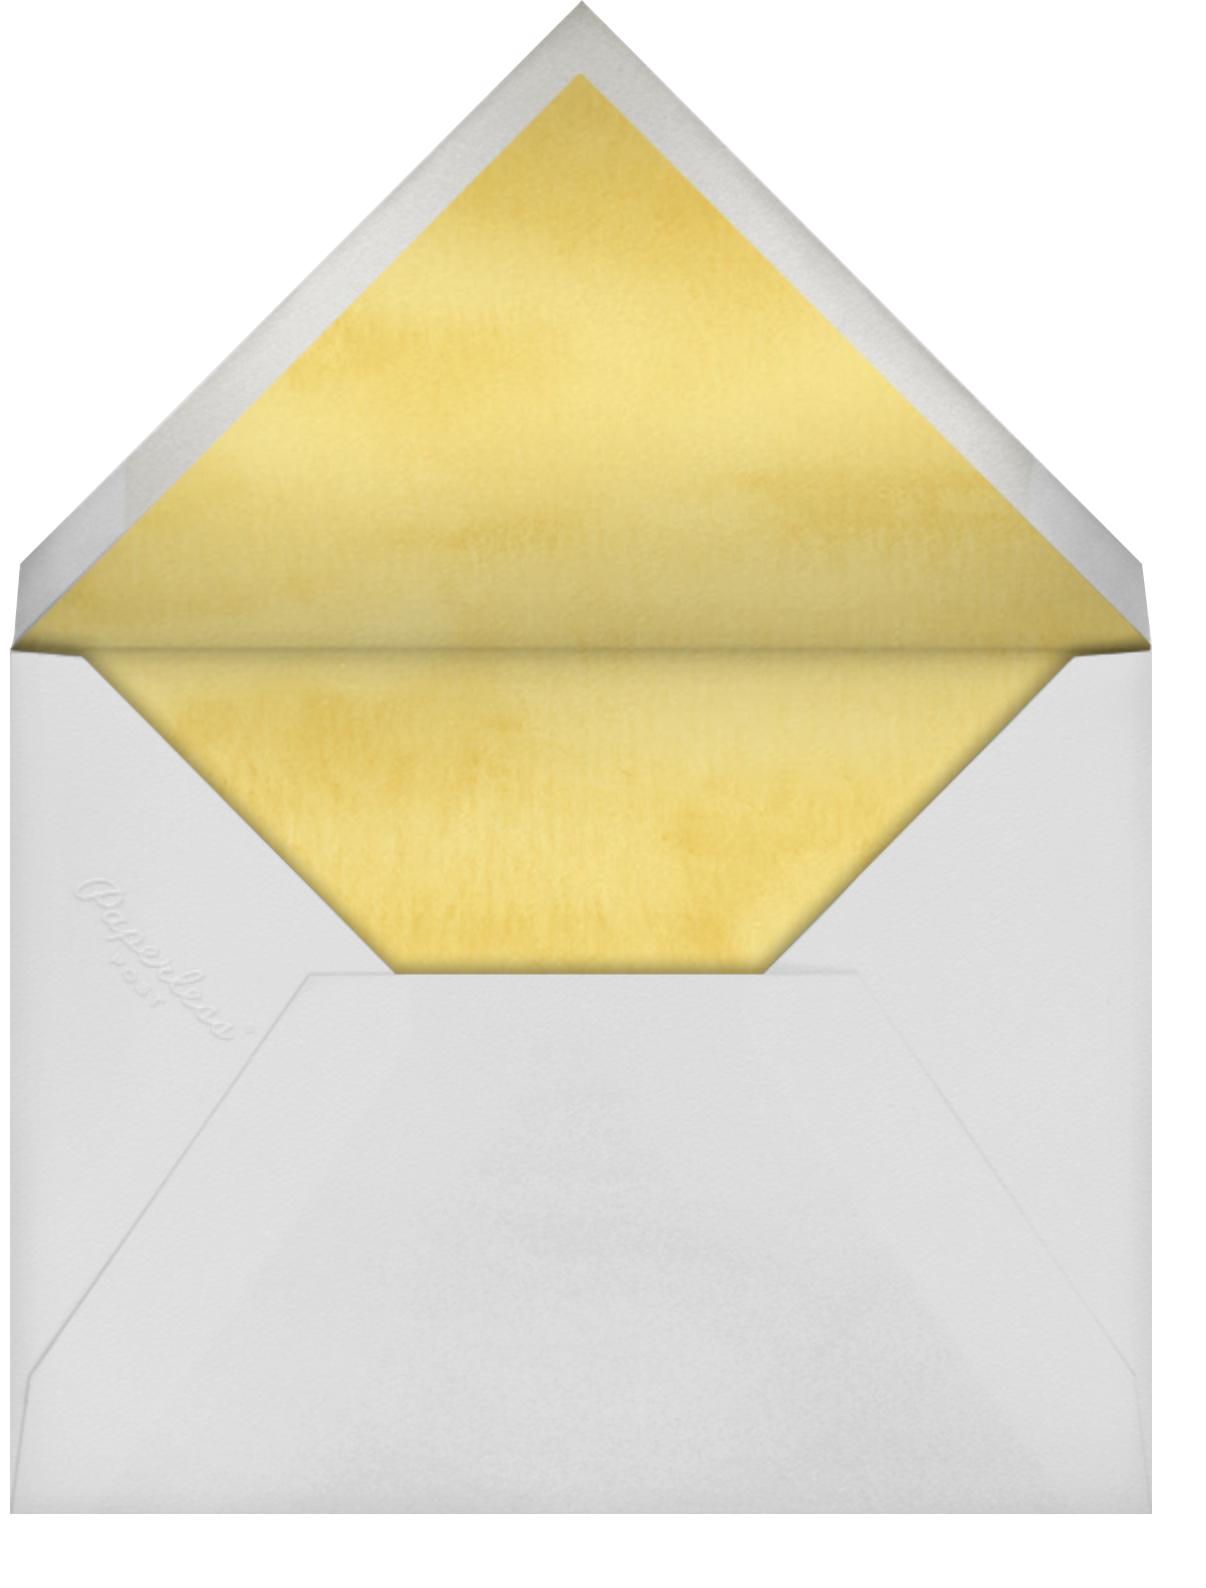 Bushel of Wheat - Felix Doolittle - Envelope